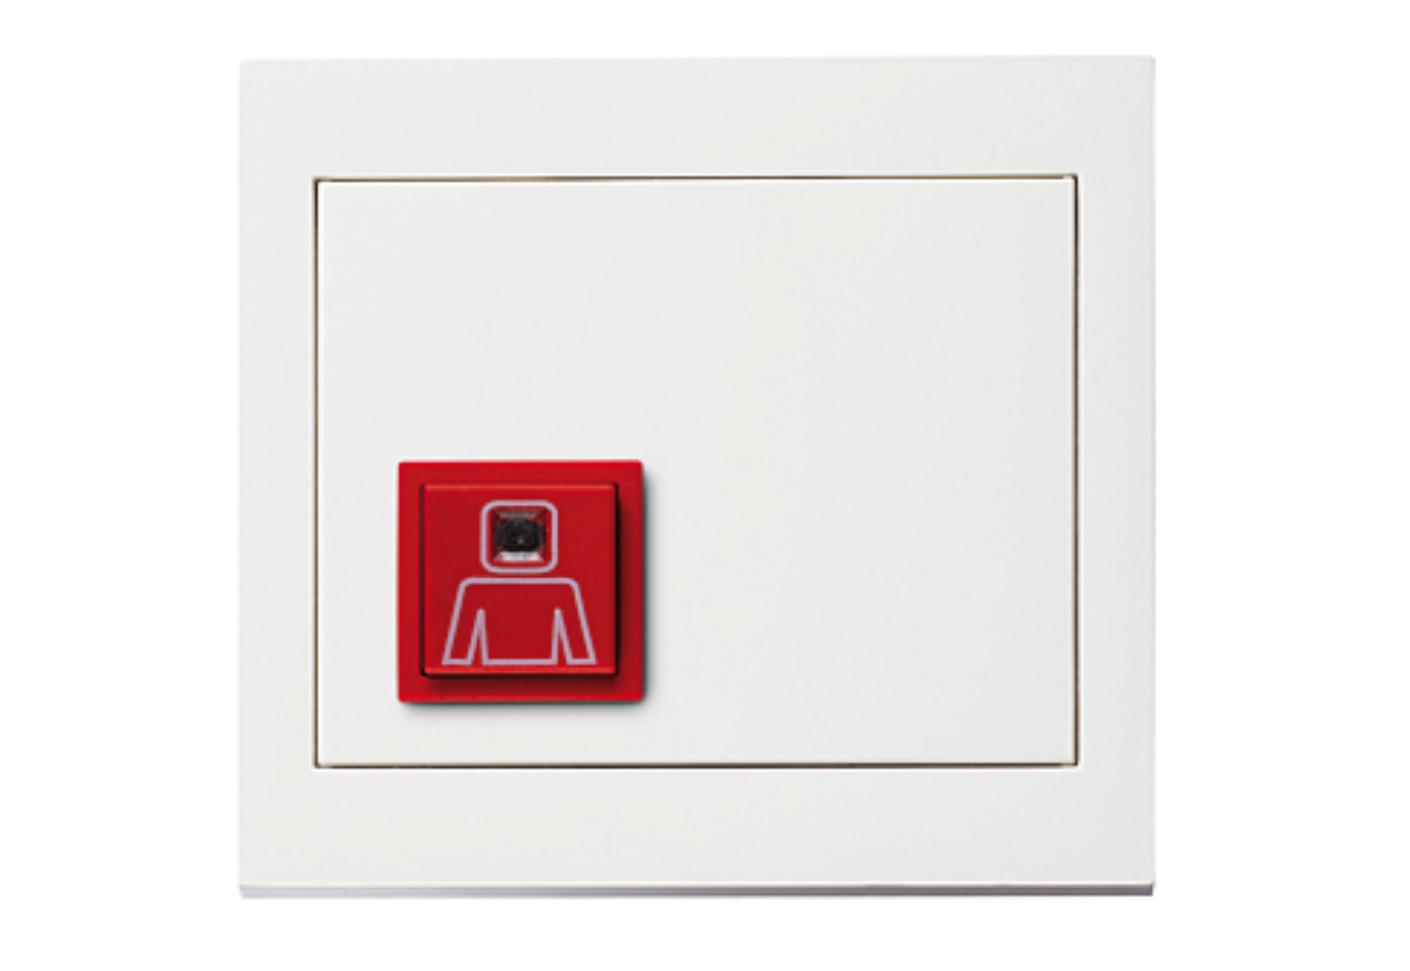 k 1 call button by berker stylepark. Black Bedroom Furniture Sets. Home Design Ideas